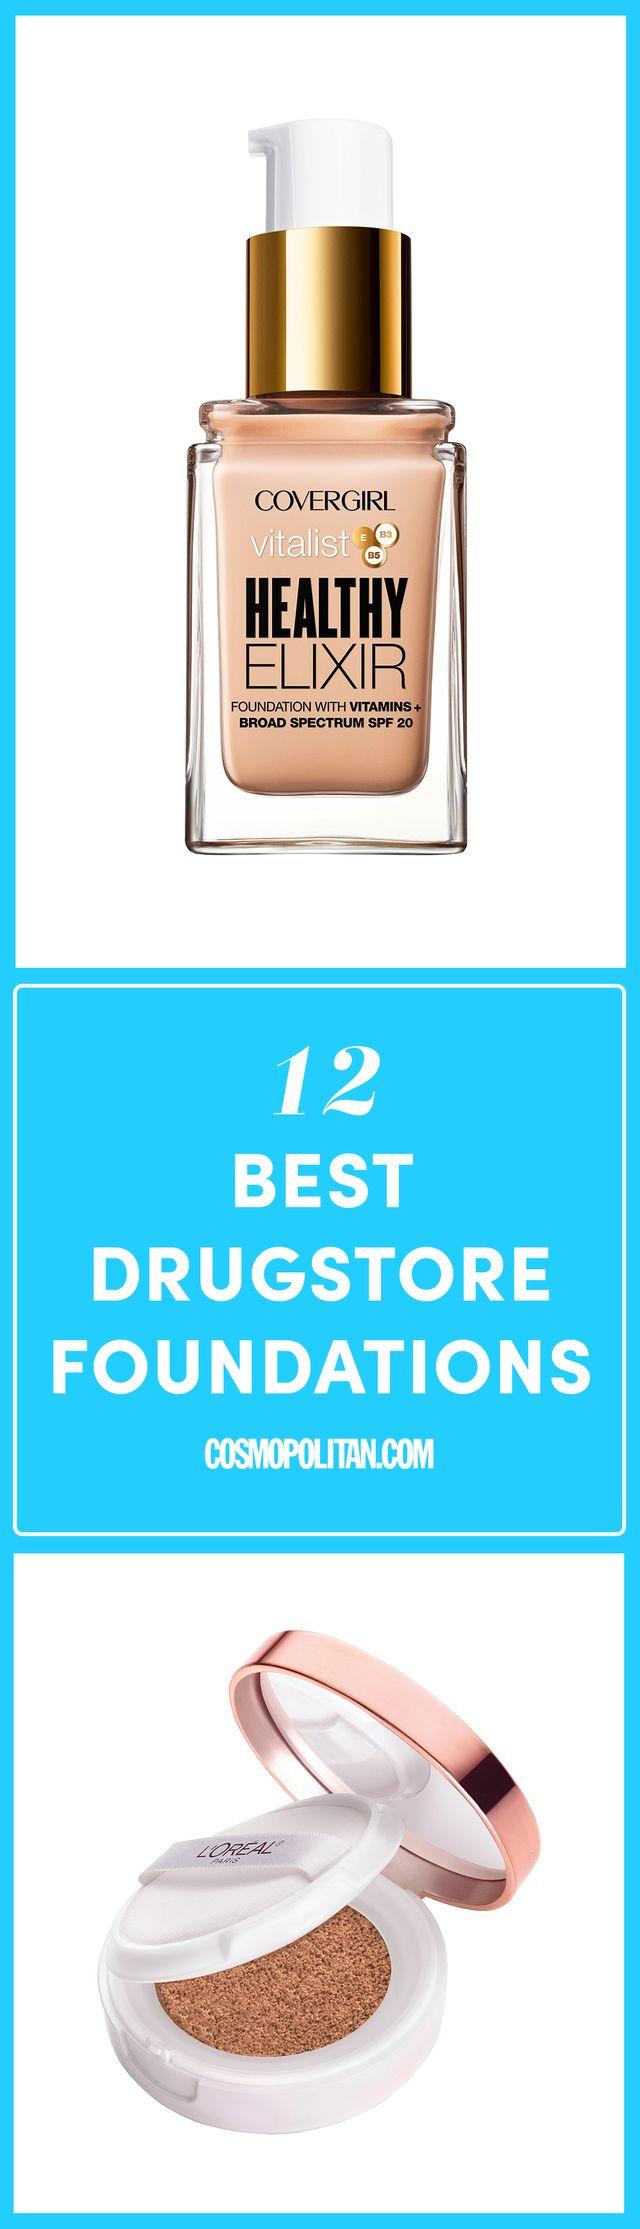 12 Best Drugstore Foundations 2017 - Top Drugstore Foundation Brands